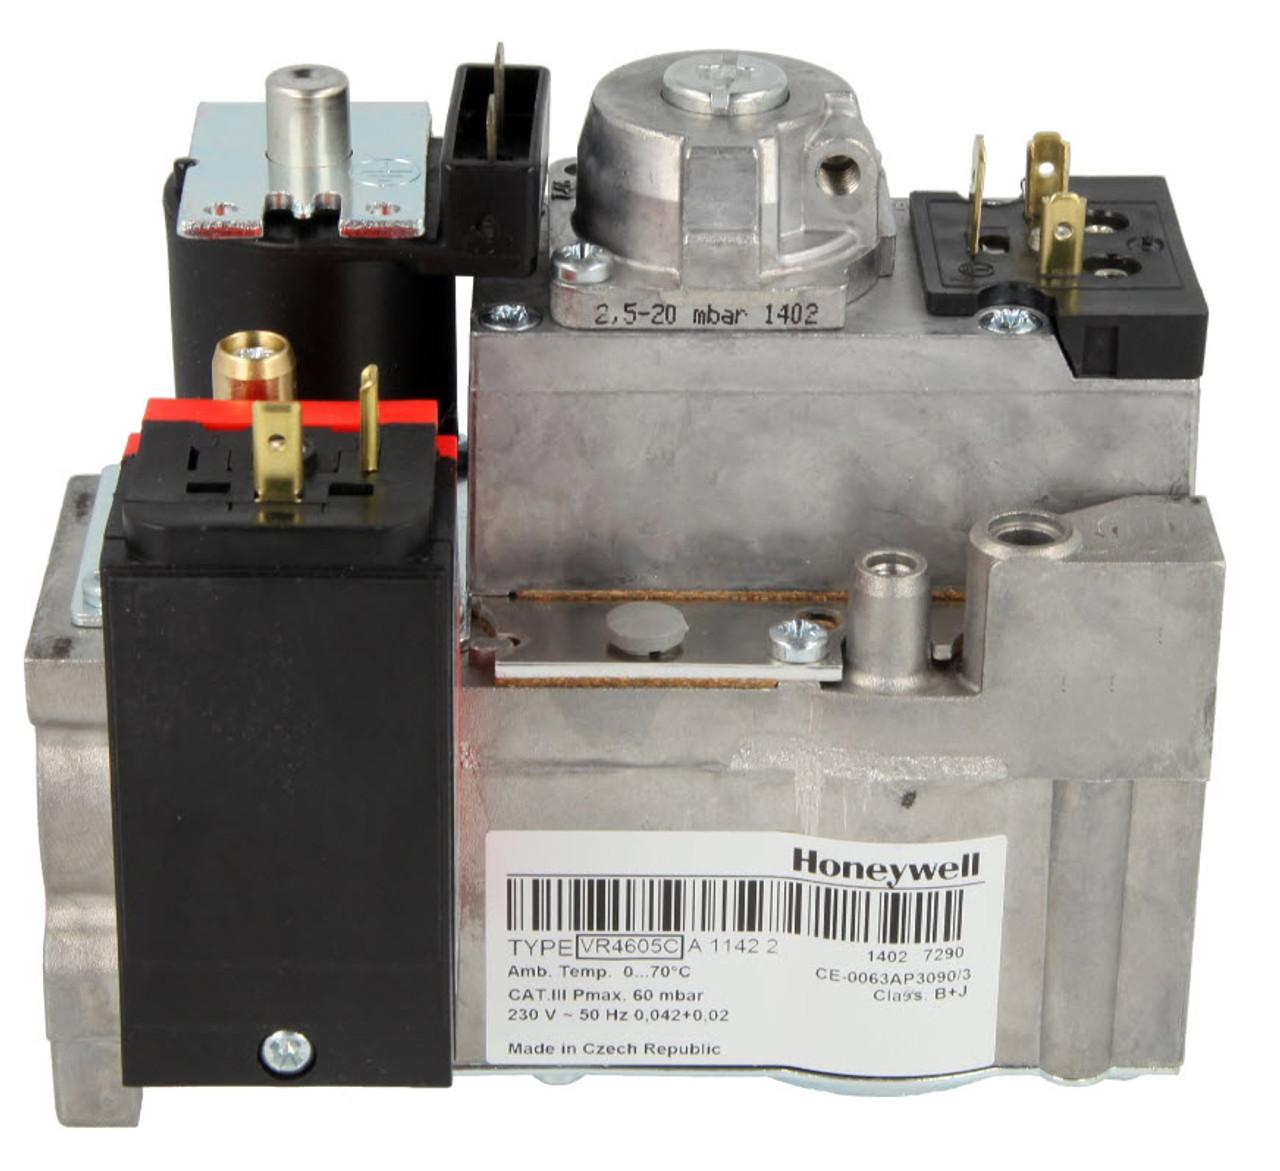 Honeywell gas control block VR4605CA1142U